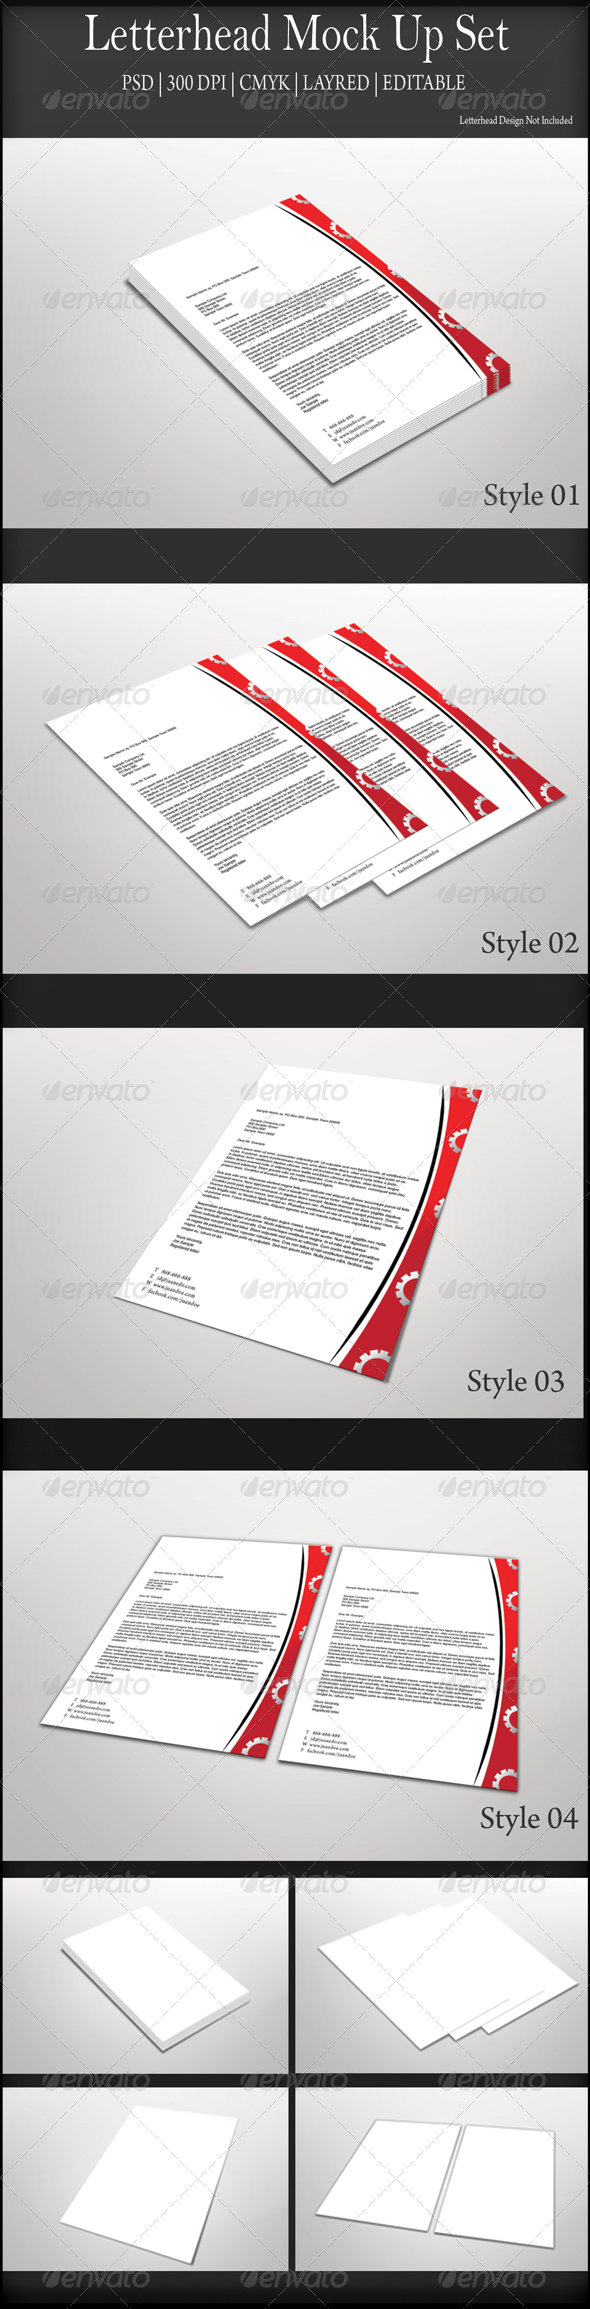 GraphicRiver Letterhead Mock Up Set 7641516